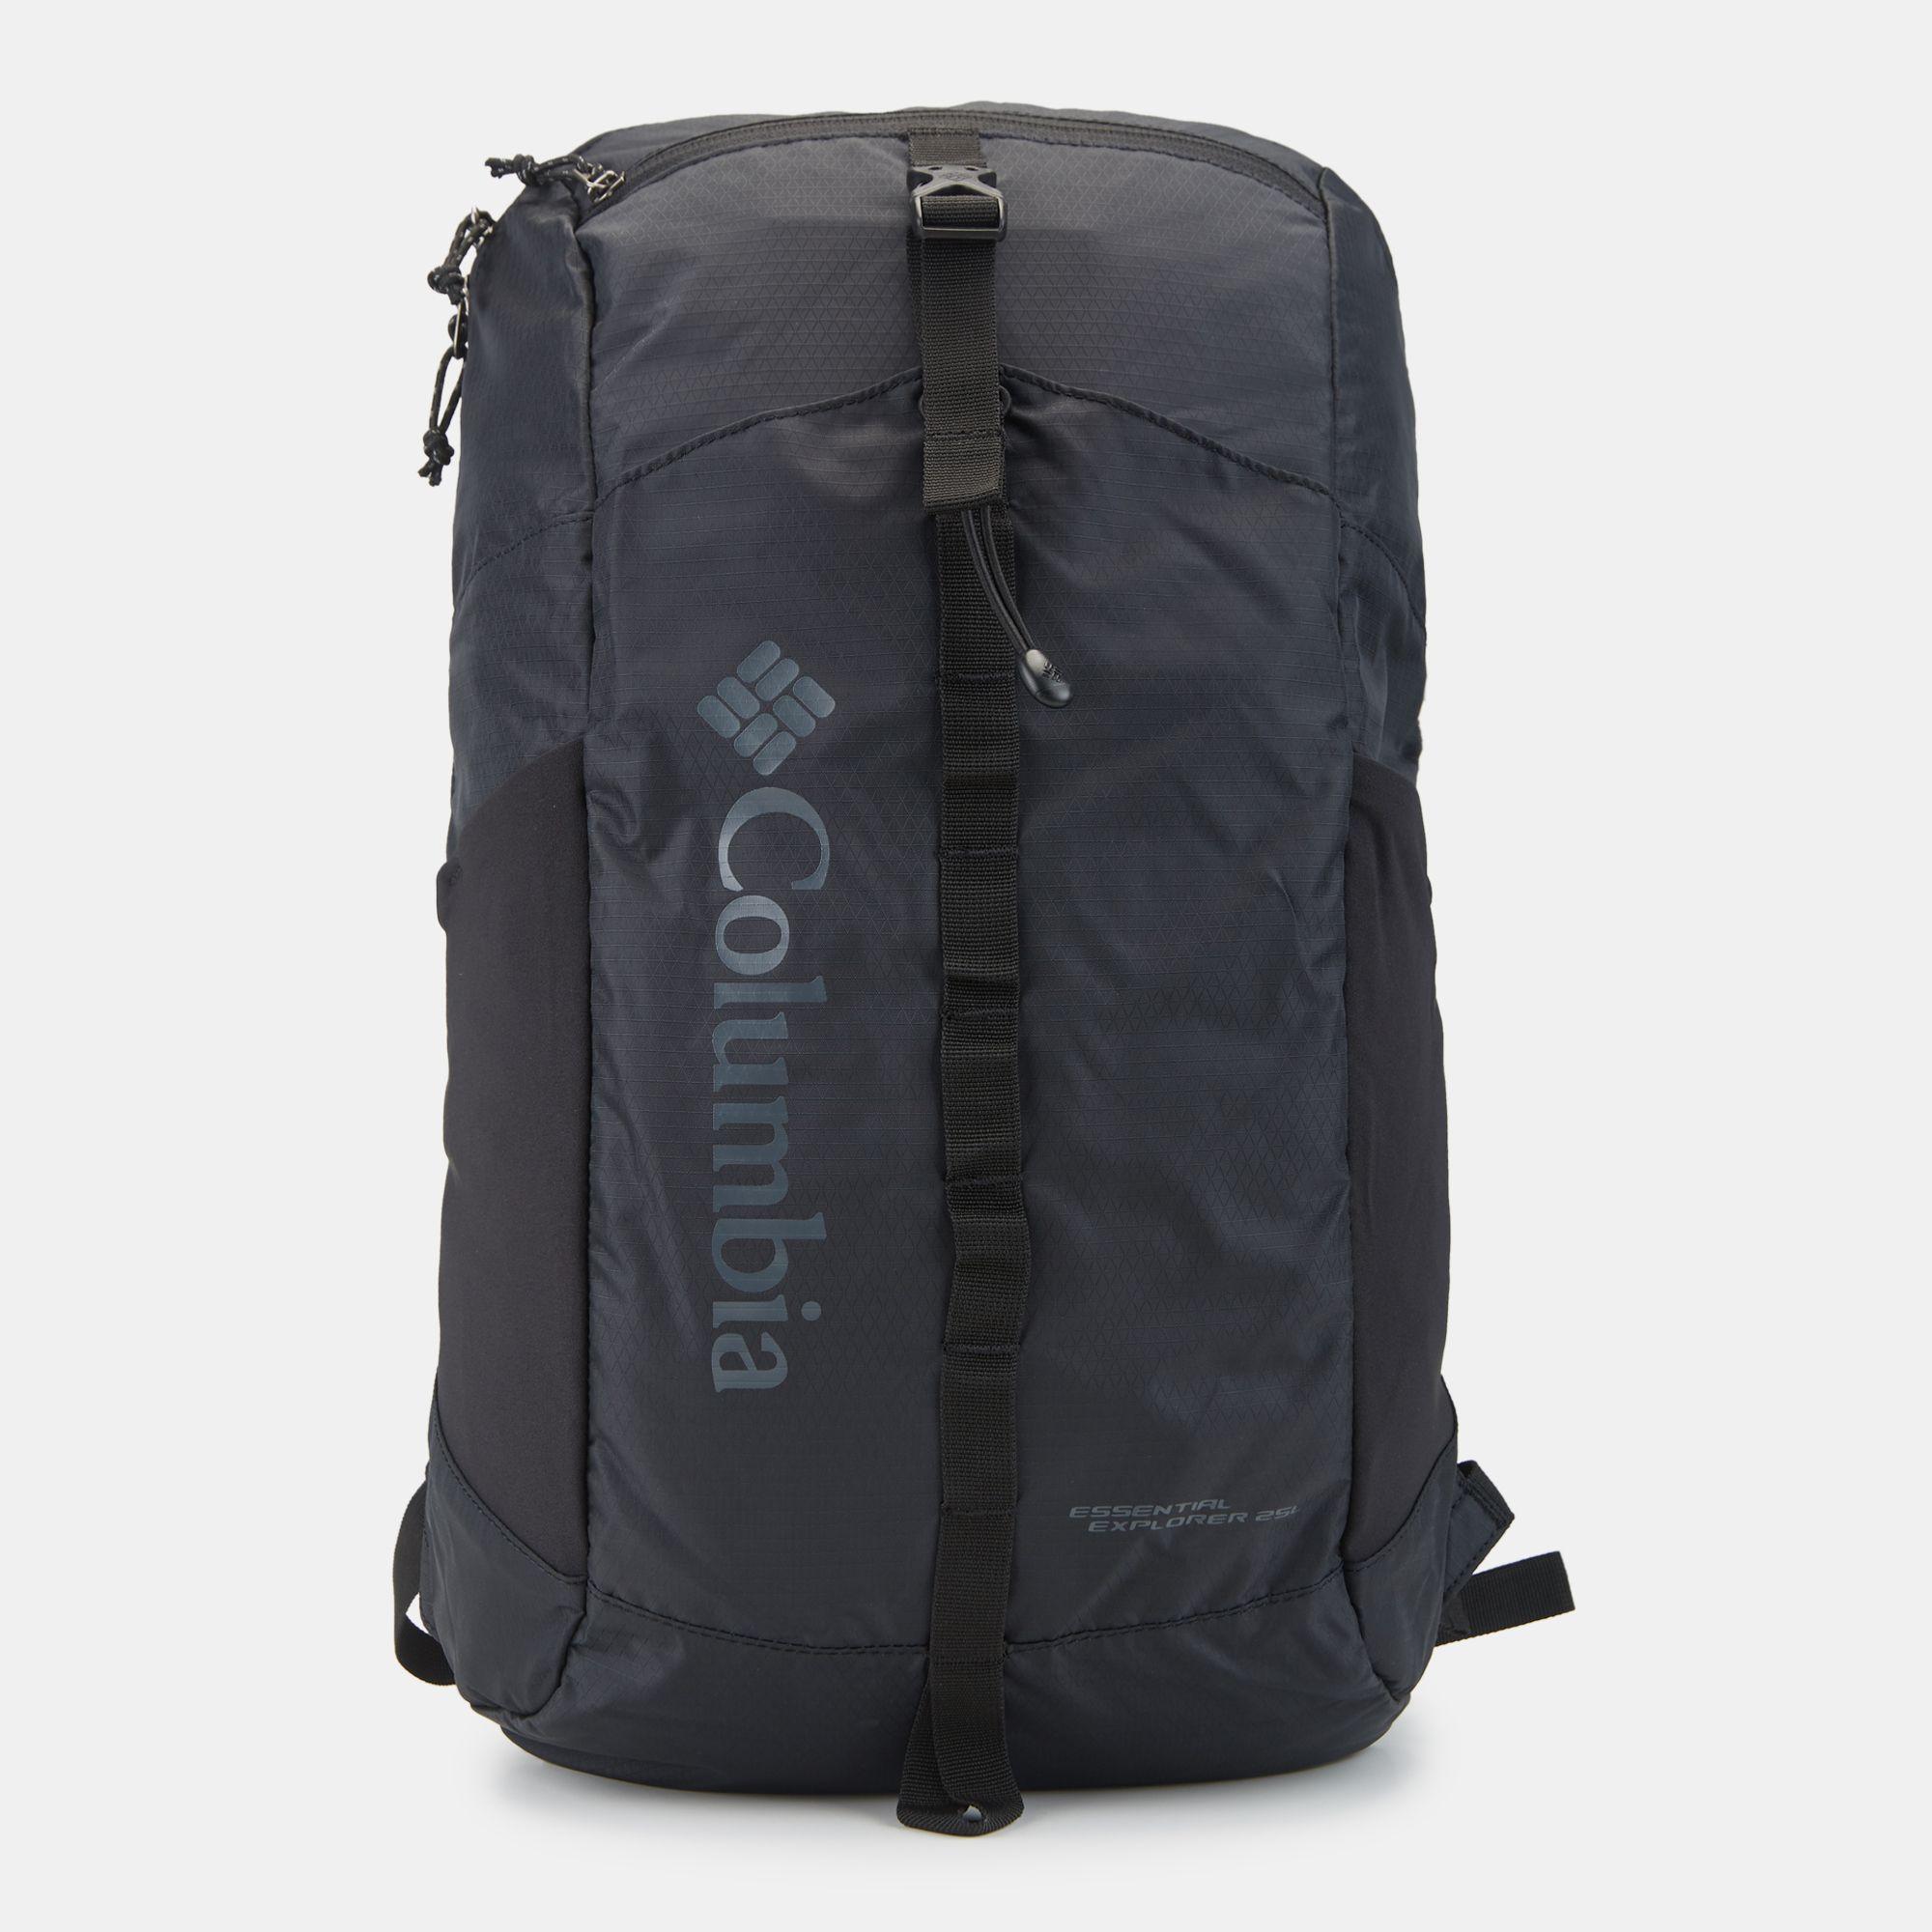 Columbia Hiking Backpack- Fenix Toulouse Handball 30eb7eed77378